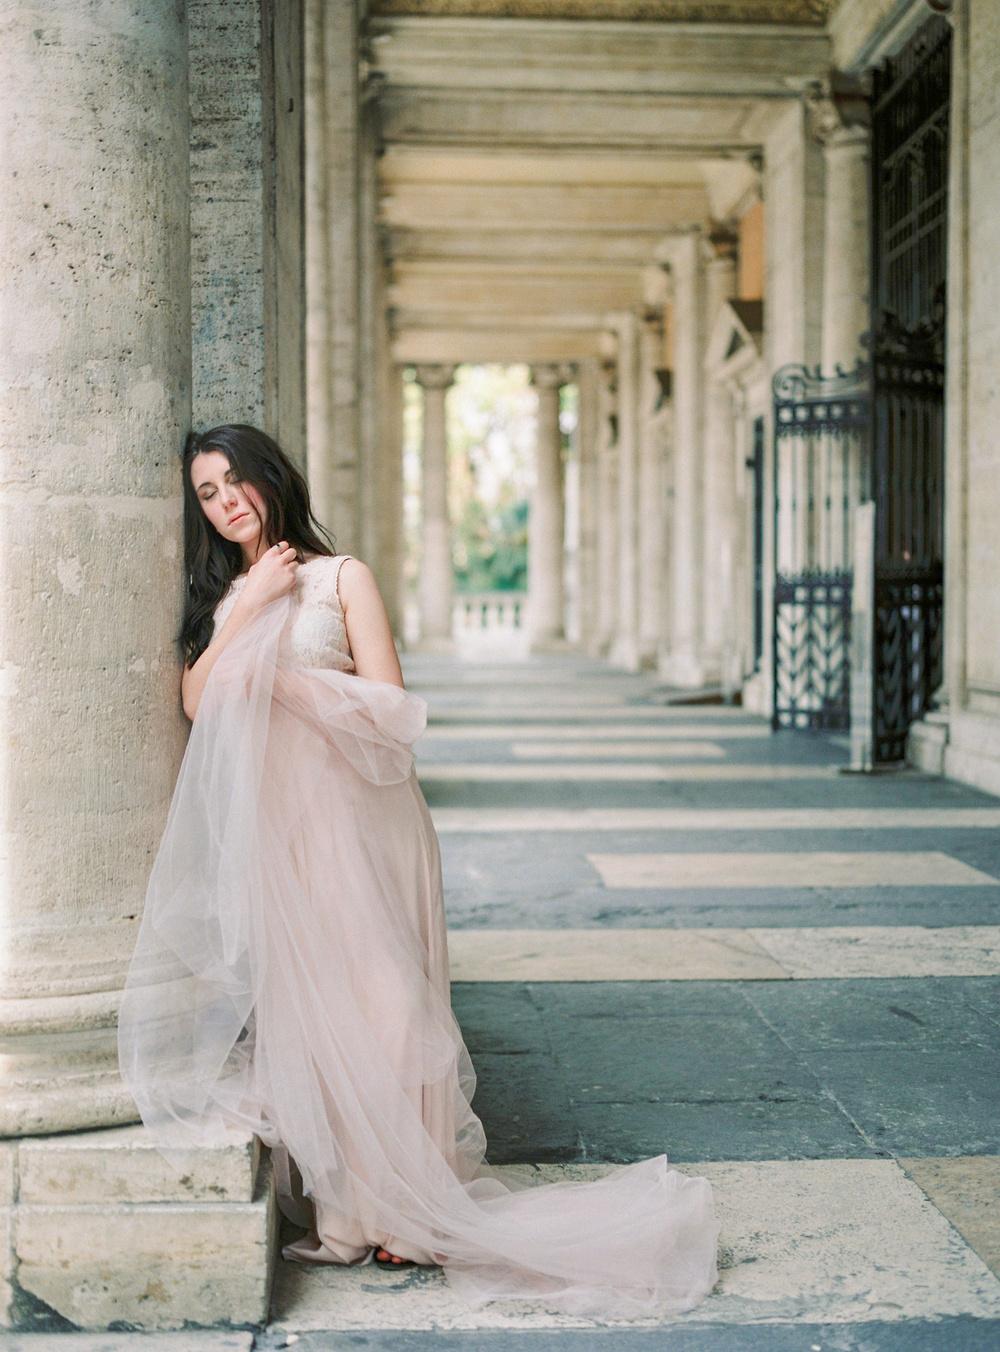 Bridal shoot in Rome